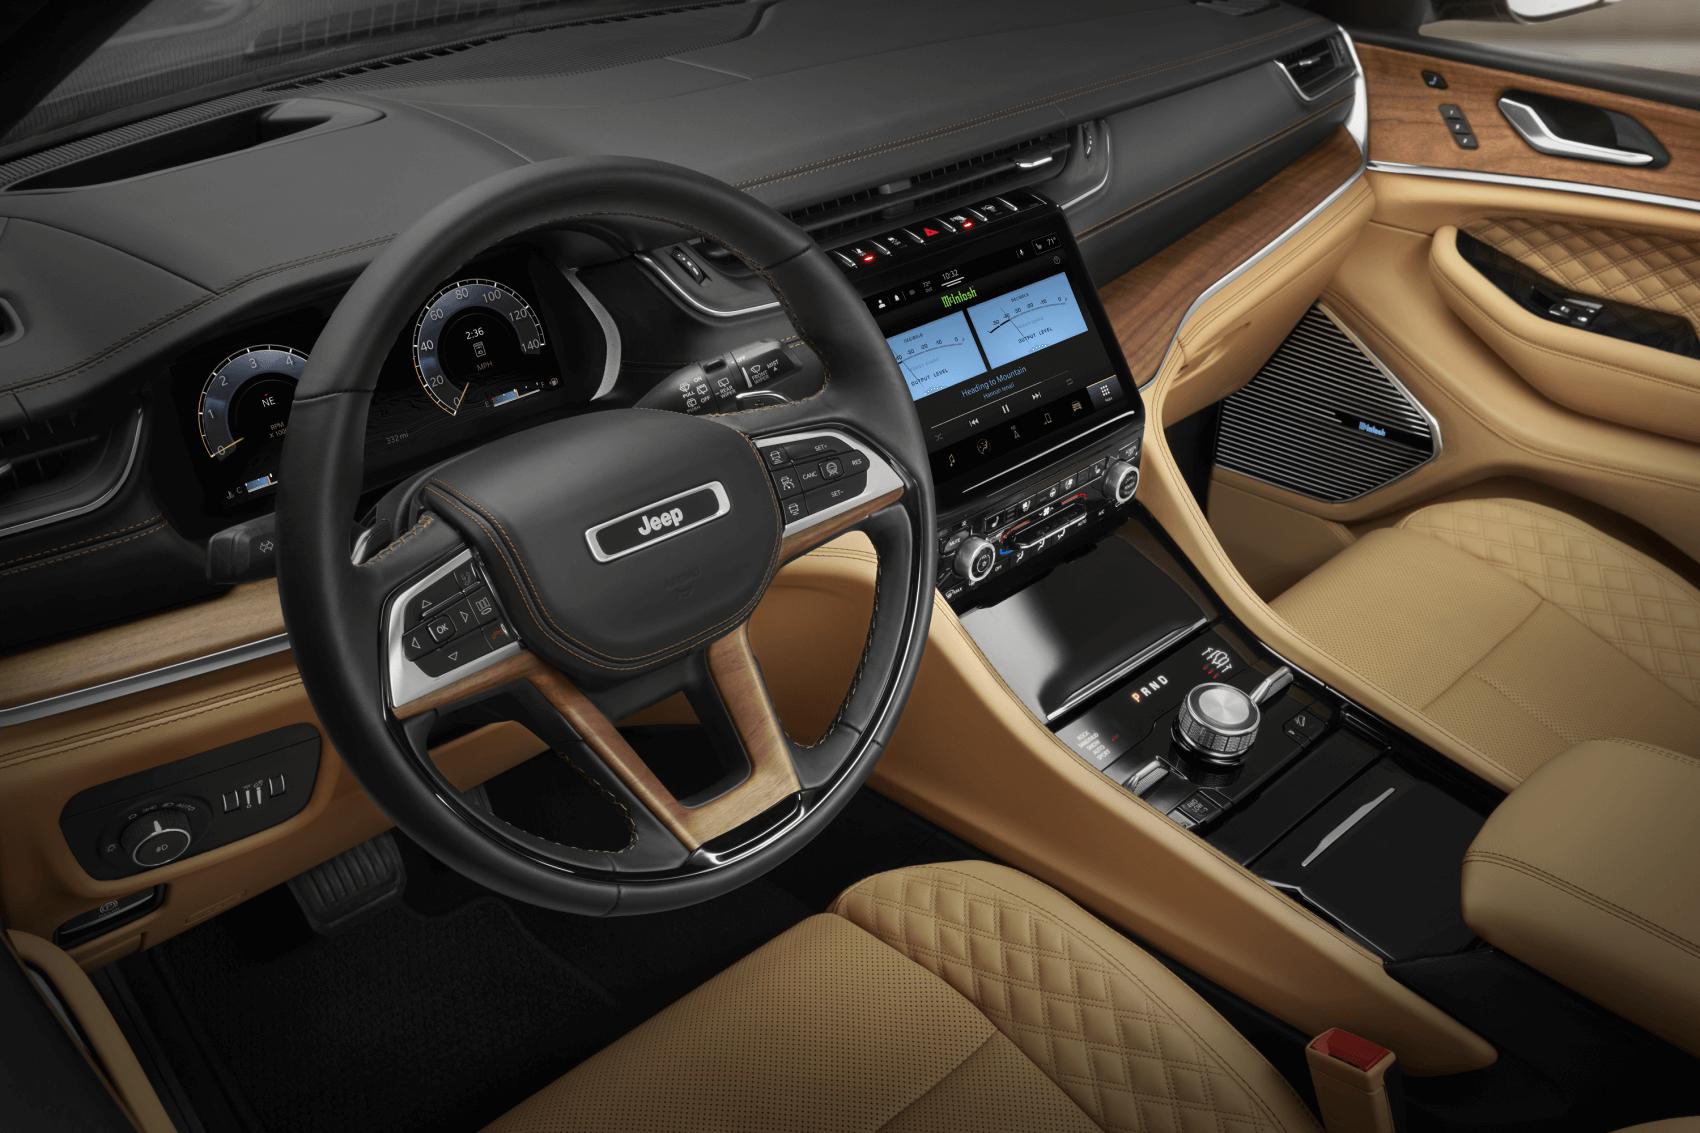 2021 Jeep Grand Cherokee L Summit Reserve Interior Dashboard Tech Findlay CDJR